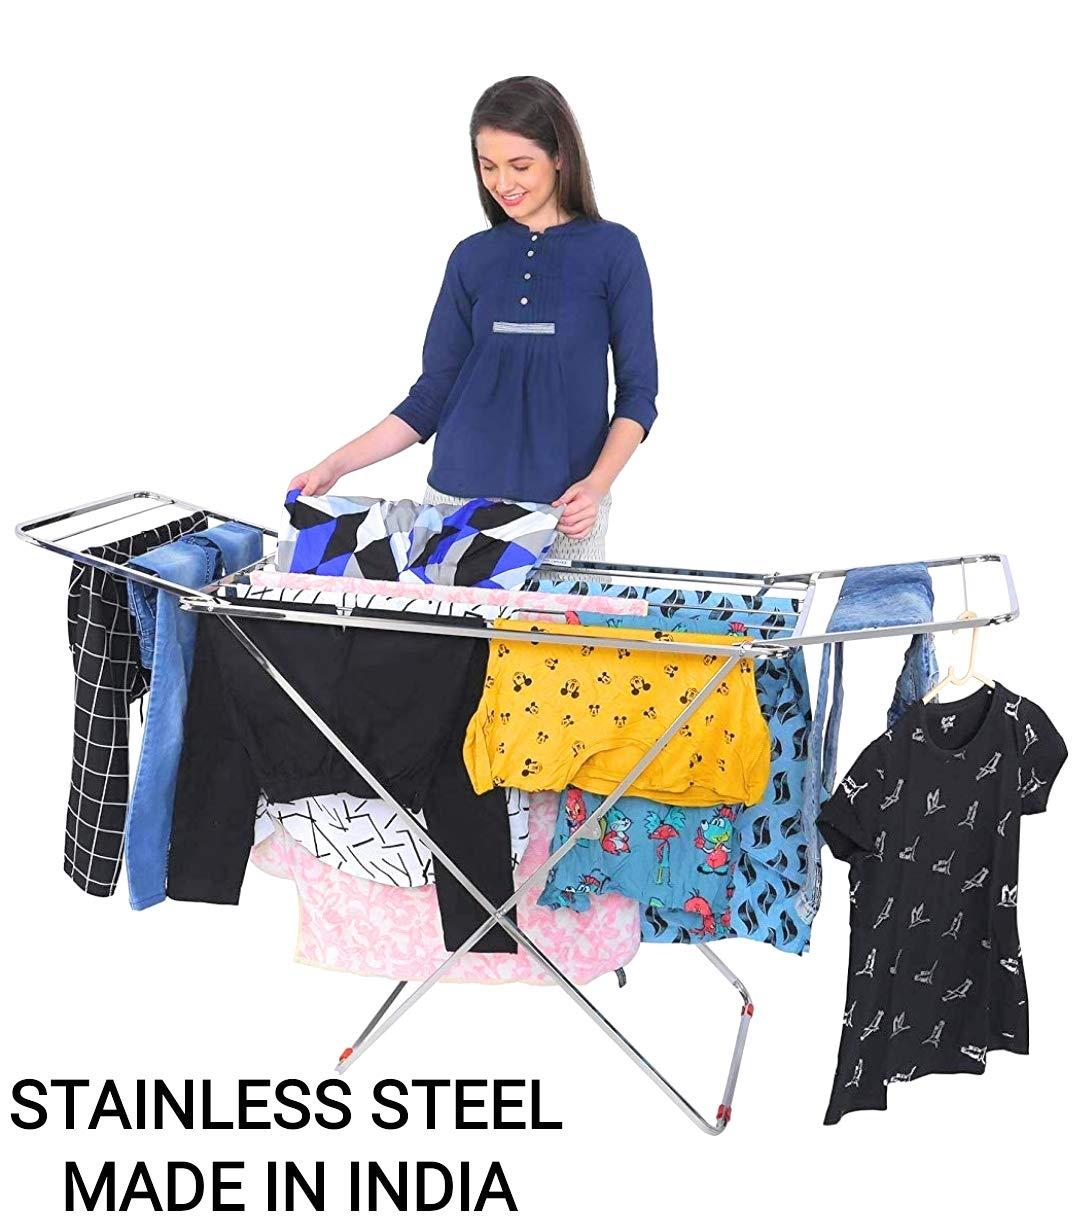 LiMETRO STEEL Stainless Steel Foldable